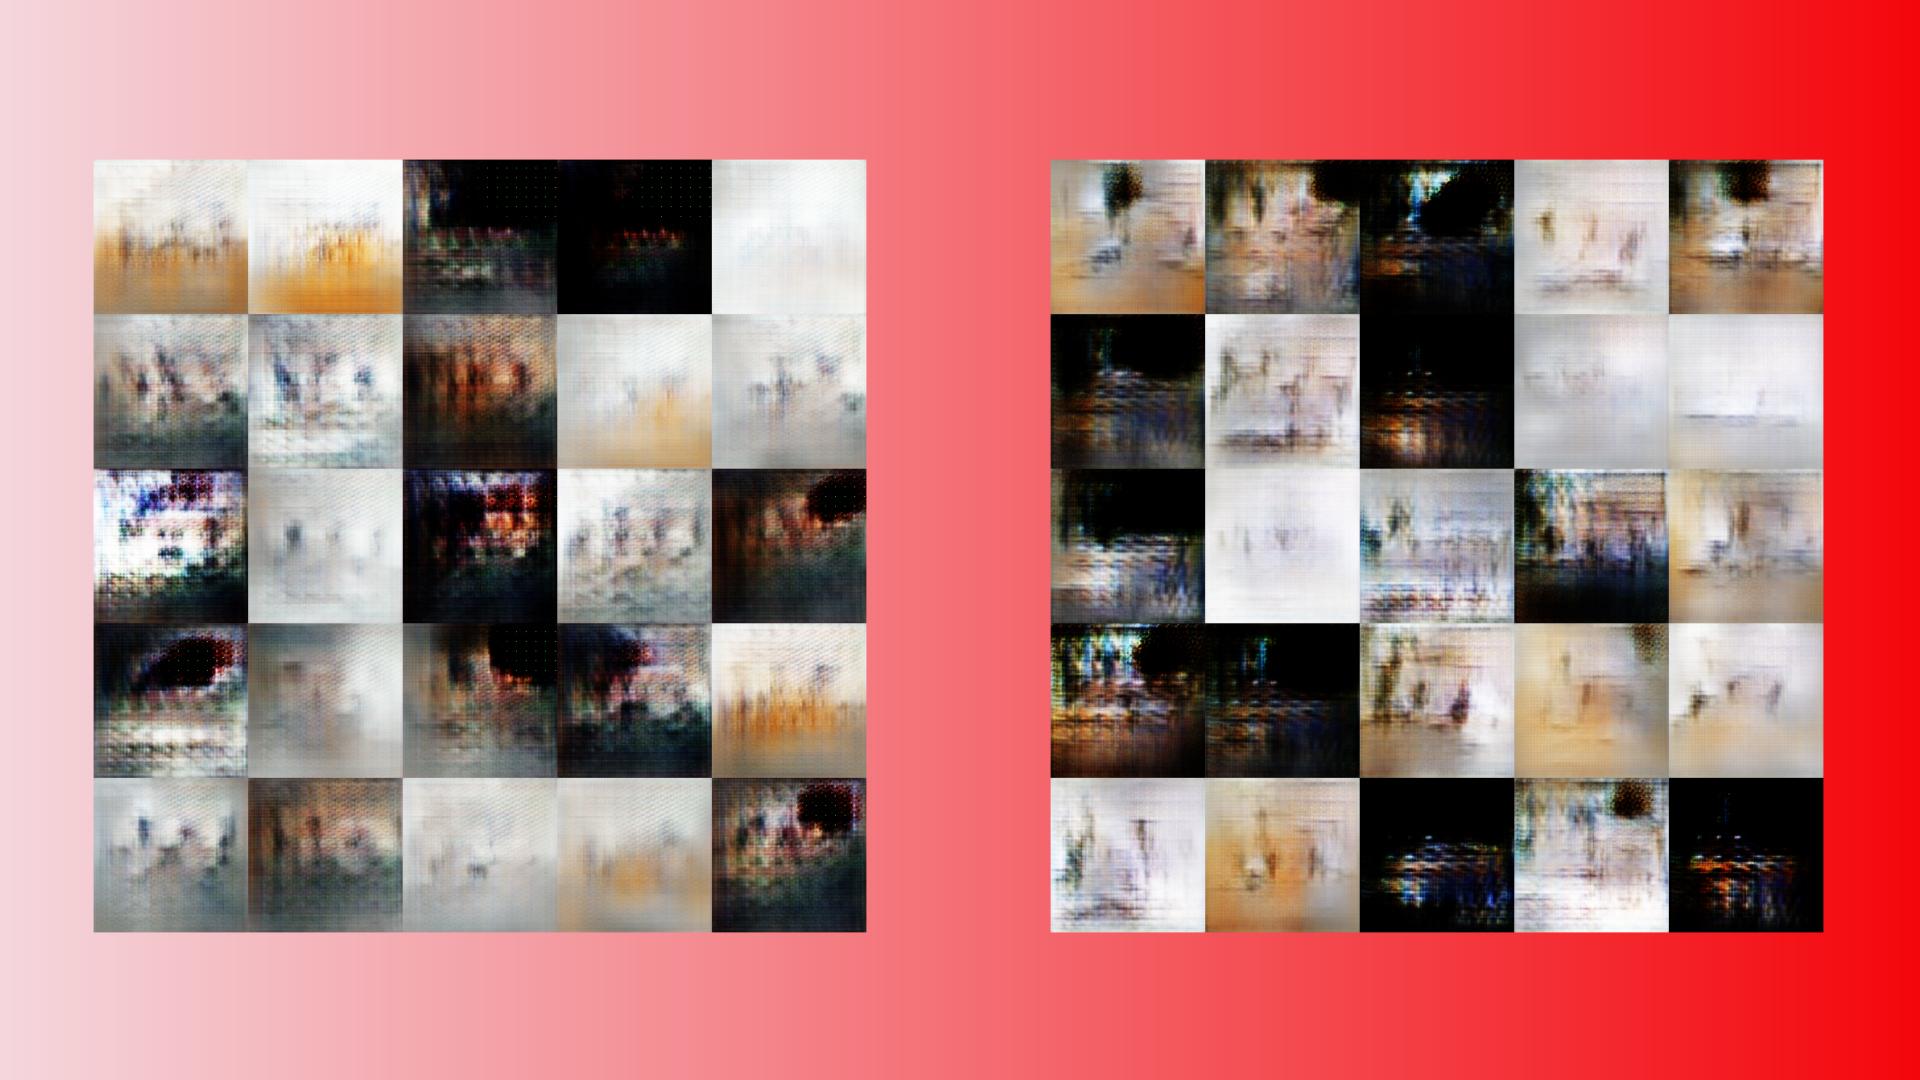 3-image.jpg